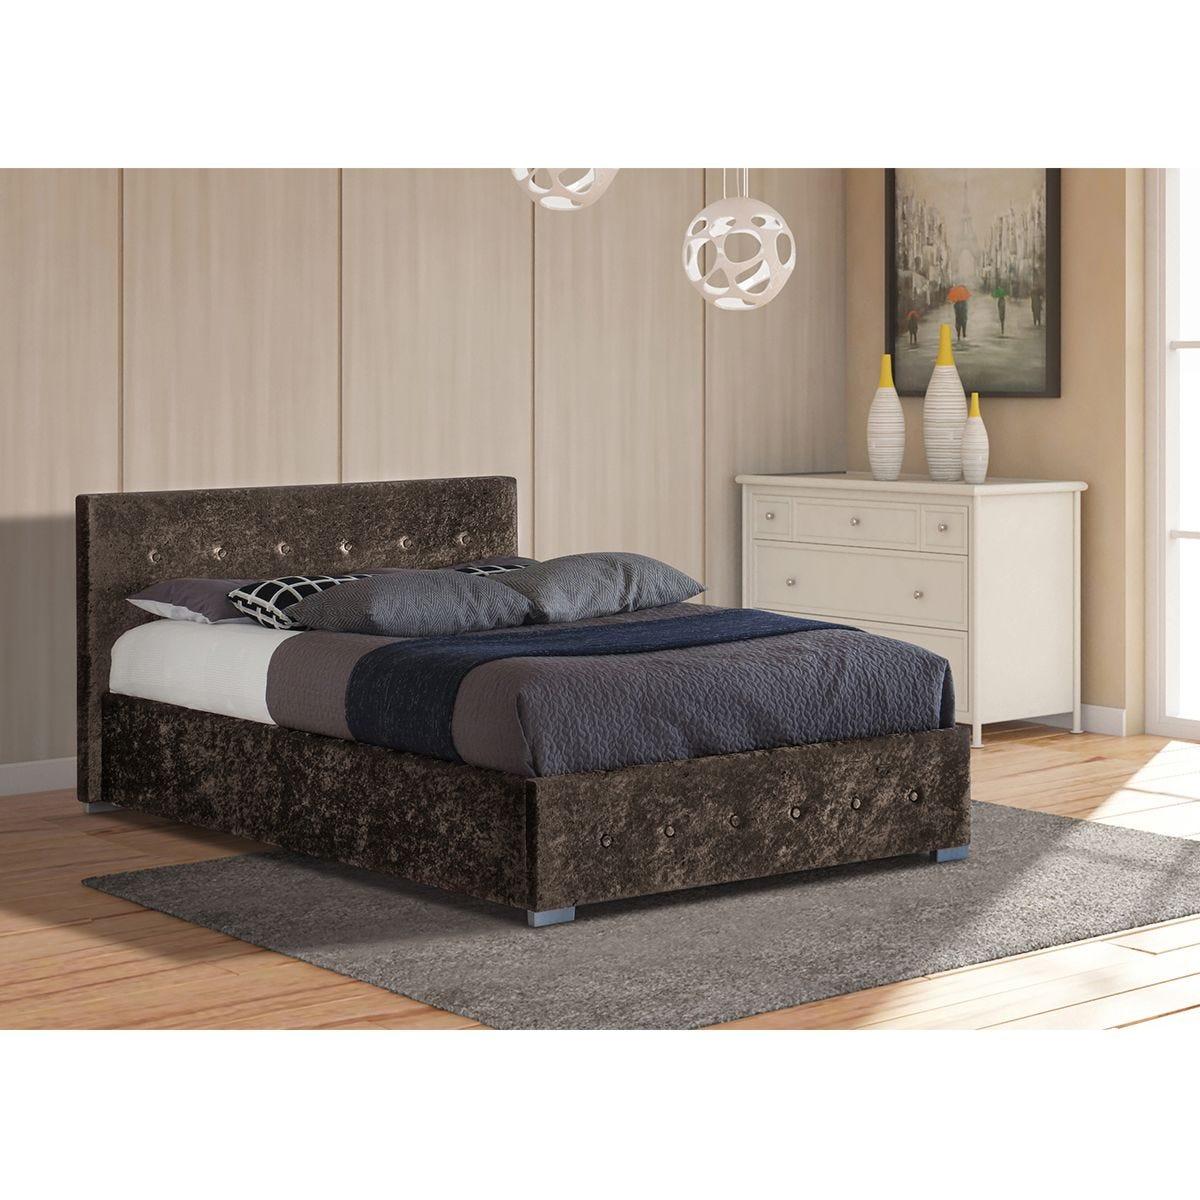 Albie Ottoman King Storage Bed - Brown